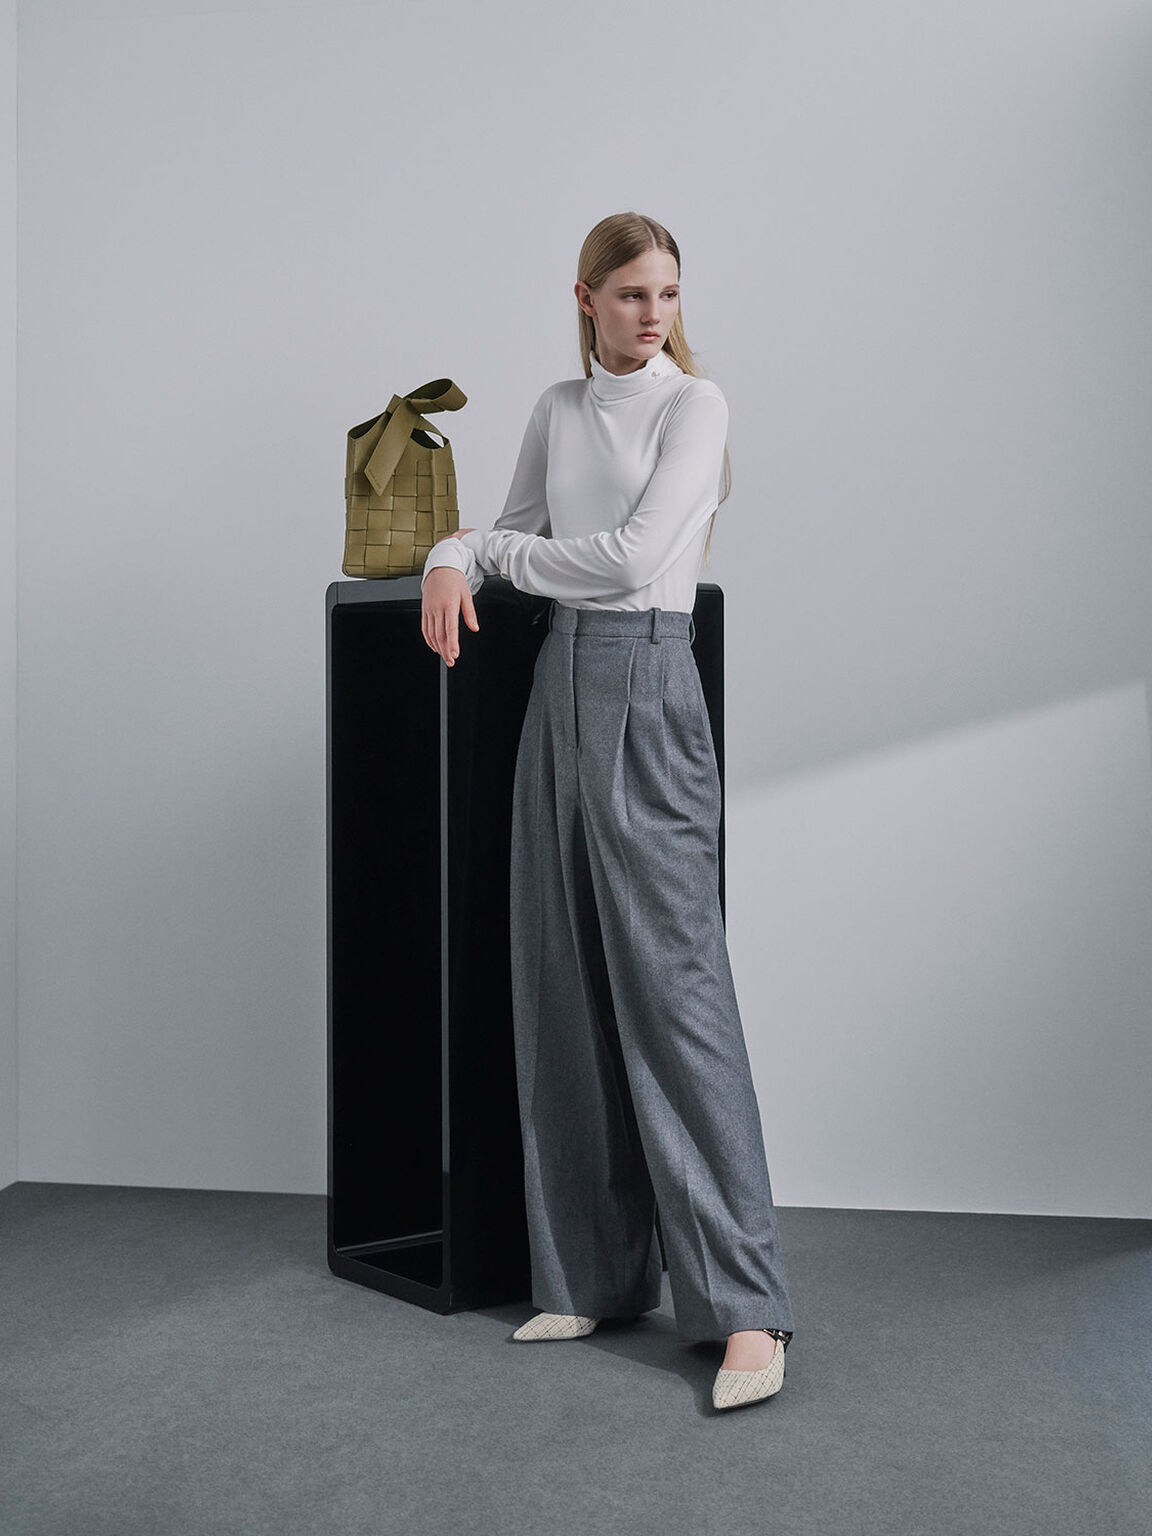 Tweed & Leather Slingback Pumps, Cream, hi-res